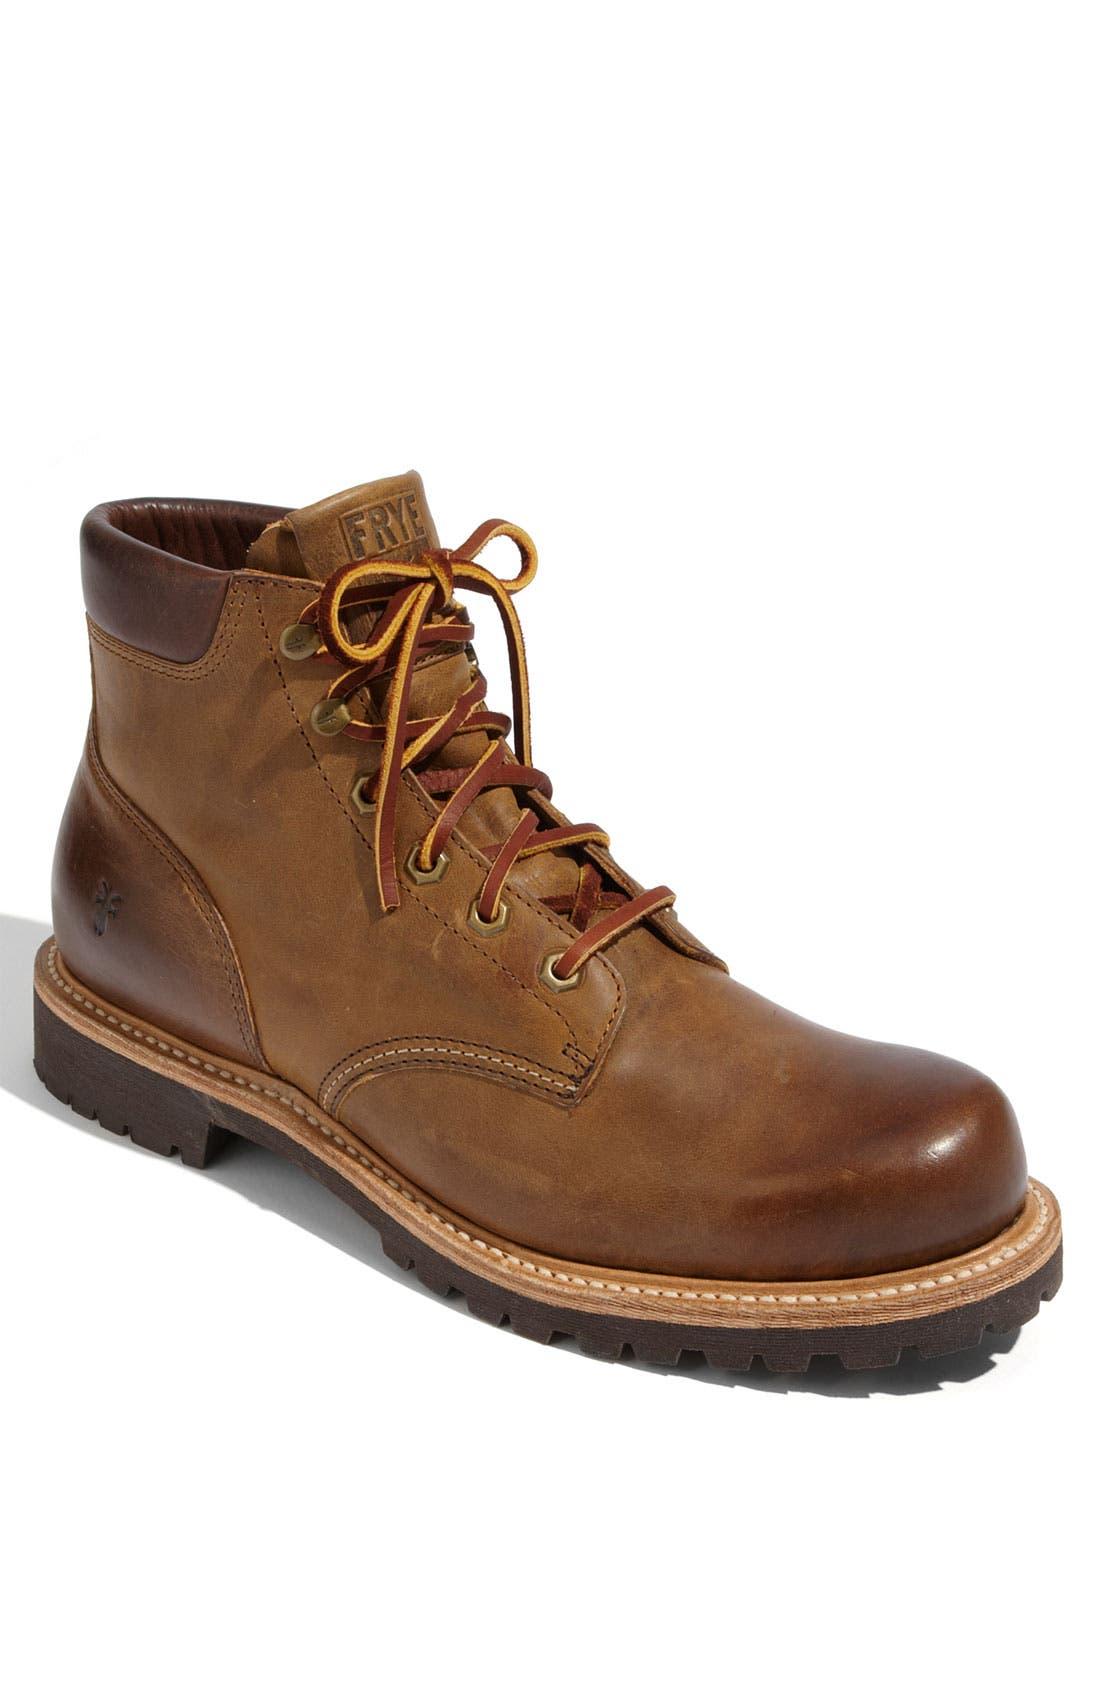 Alternate Image 1 Selected - Frye 'Dakota' Plain Toe Boot